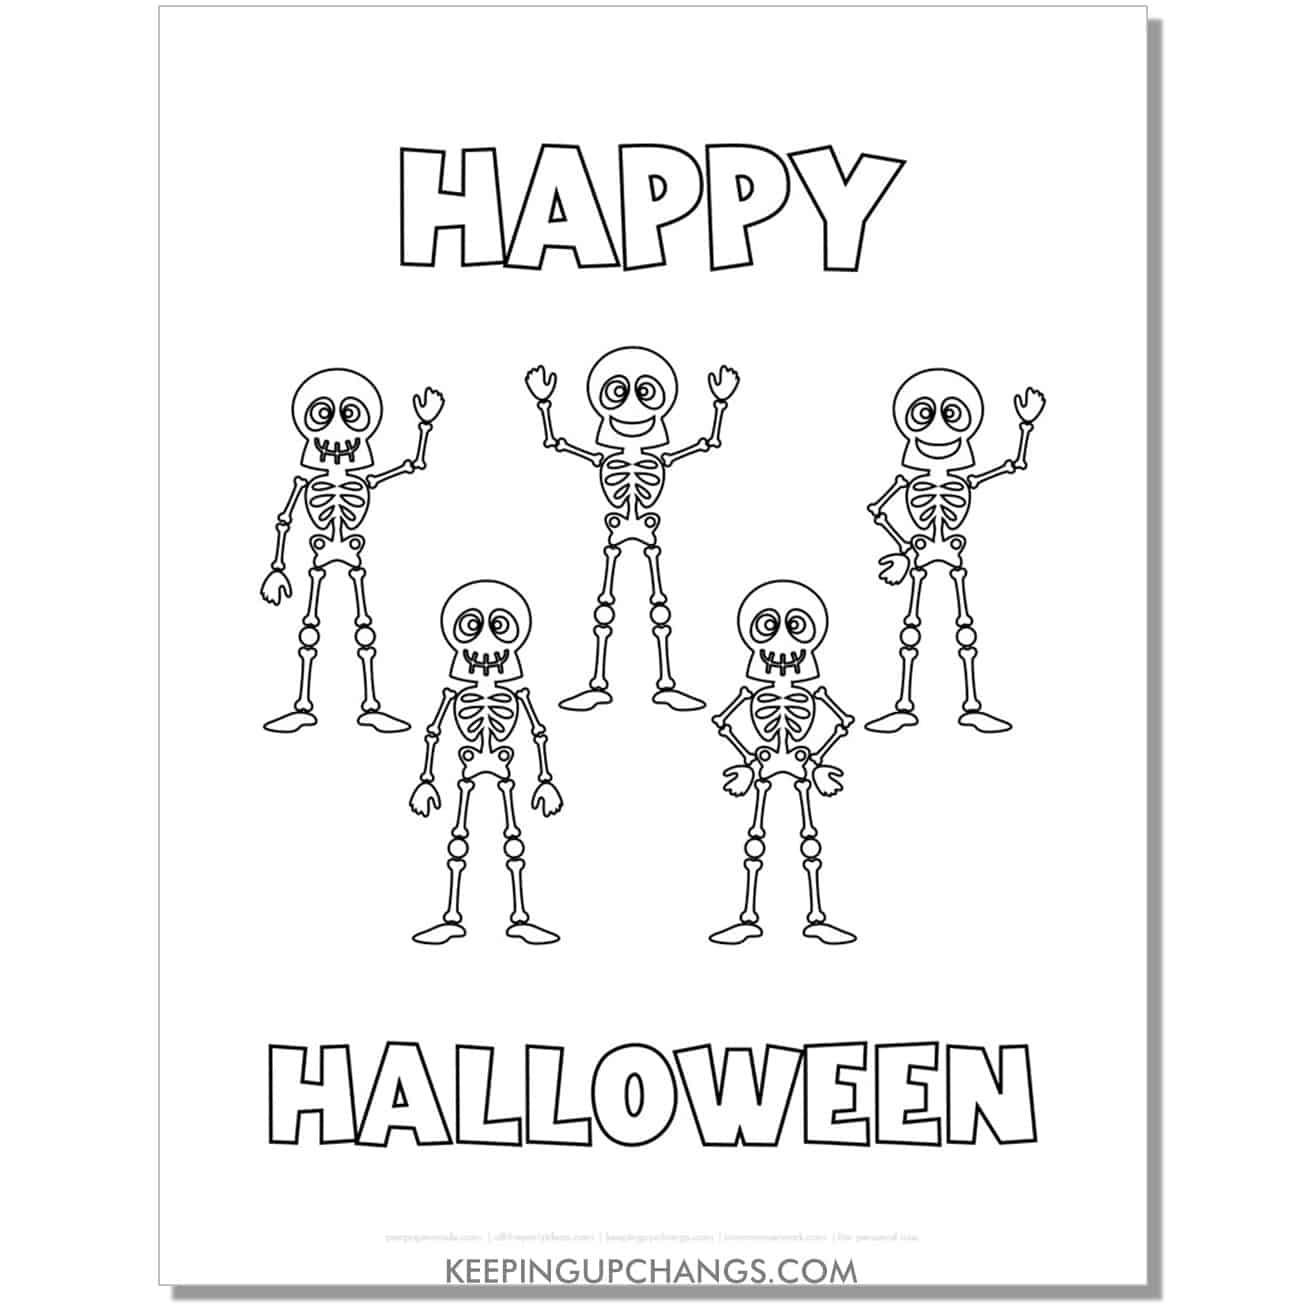 free dancing, friendly skeleton happy halloween coloring page.